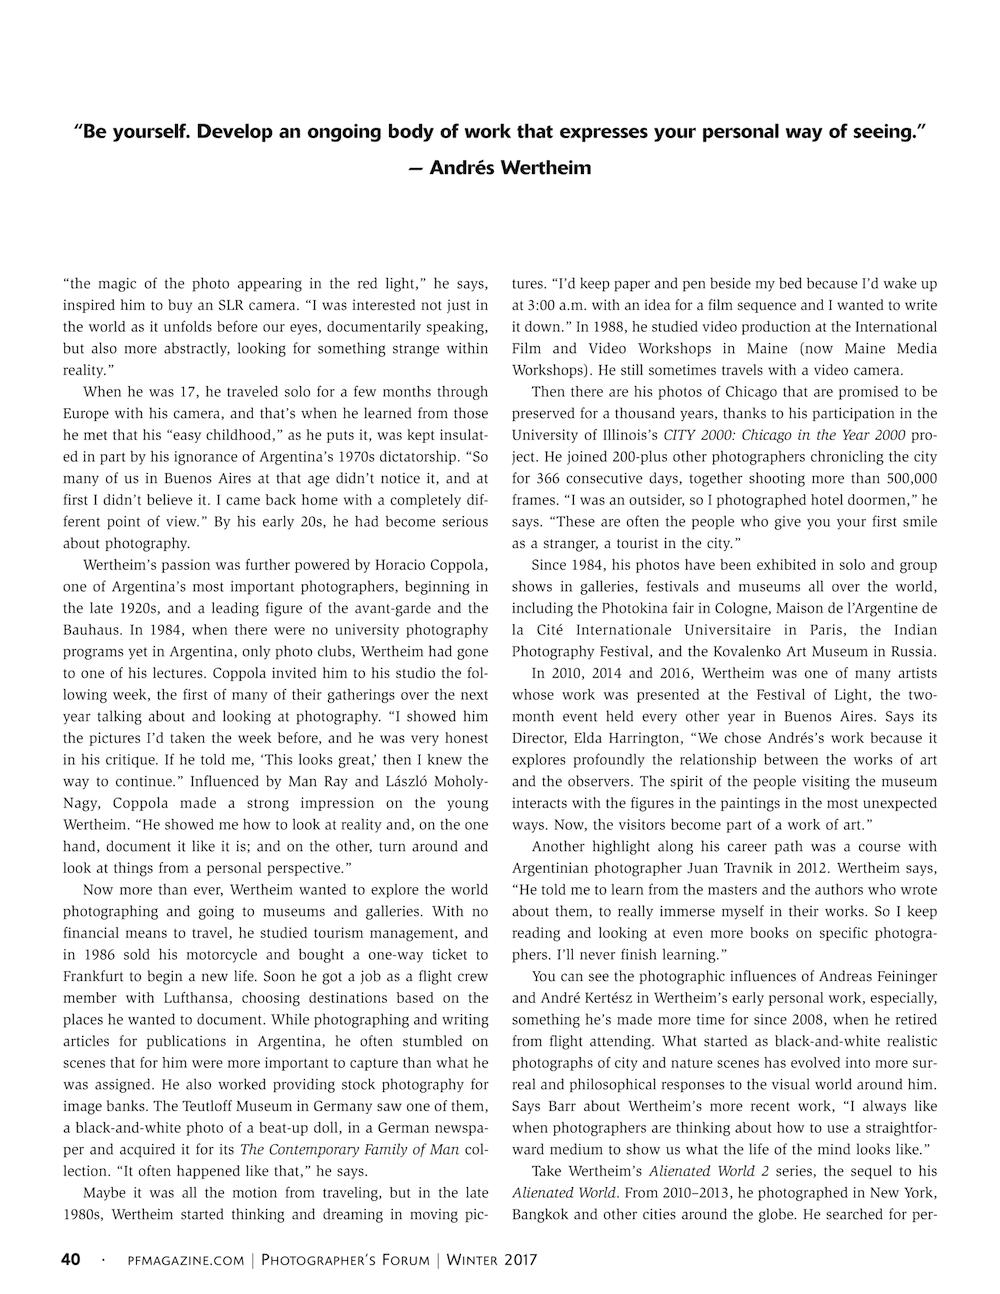 PFNOV17 Wertheim cropped PDF-07.png